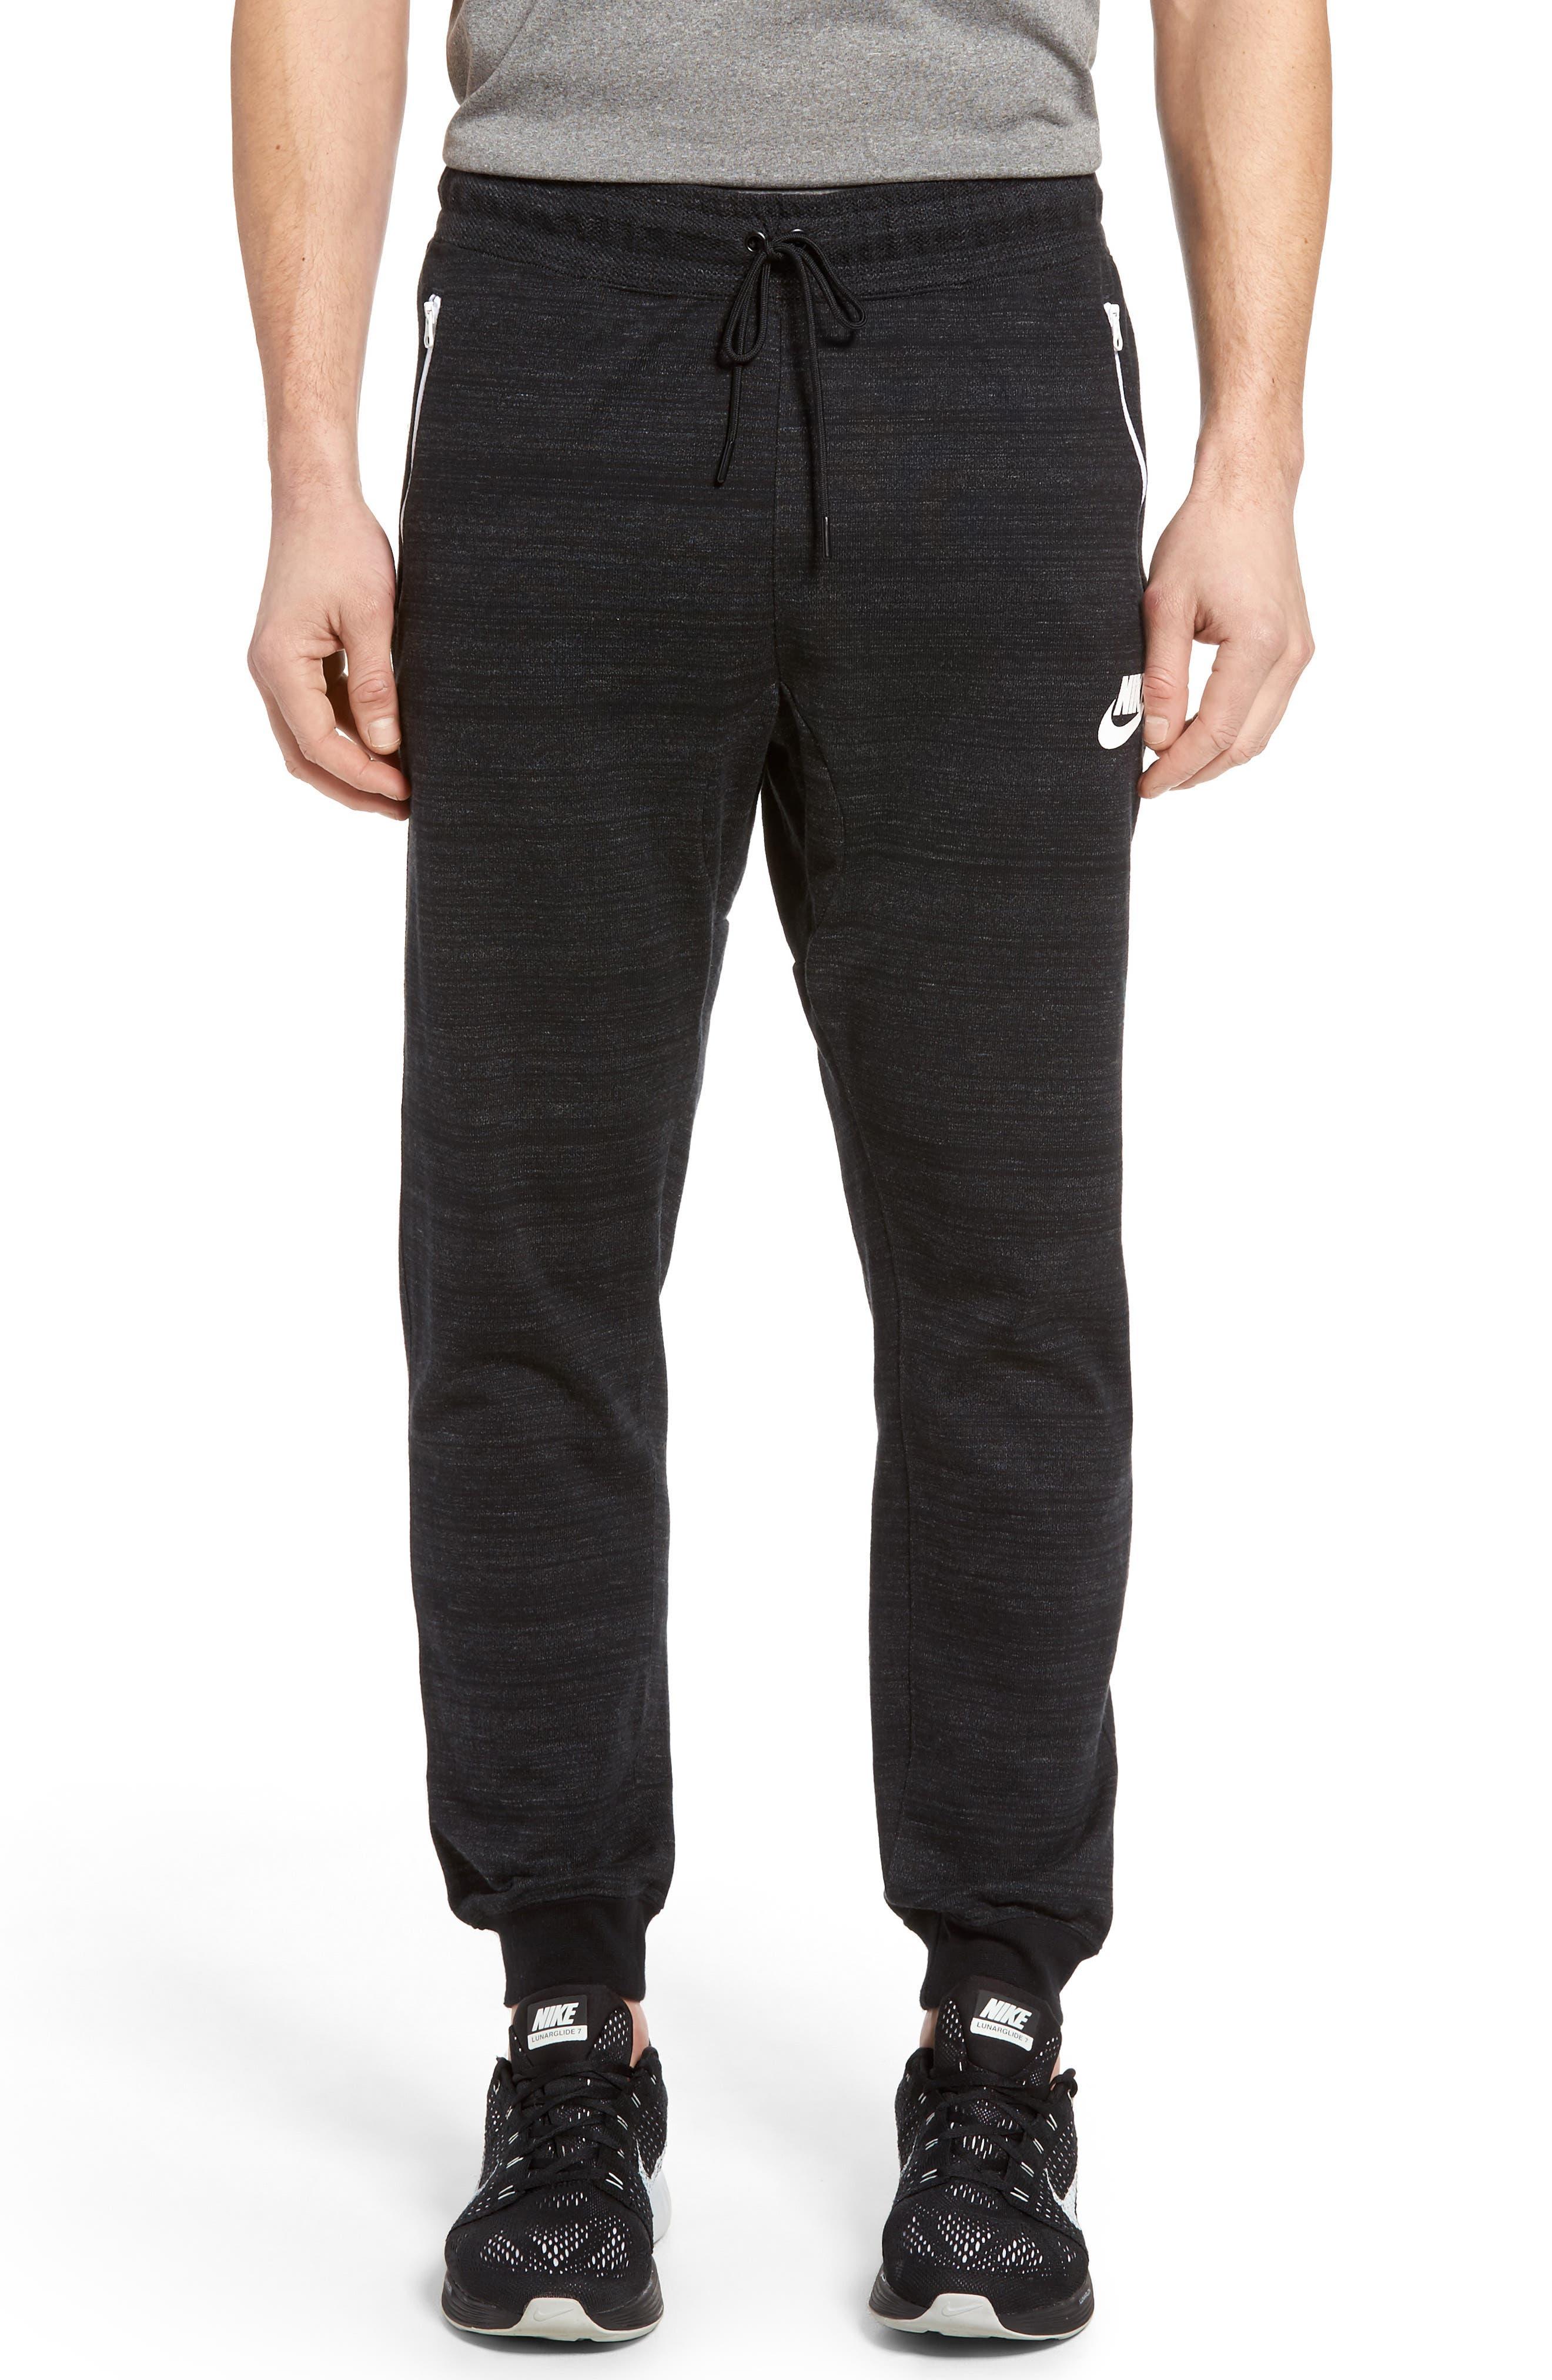 Main Image - Nike Advance 15 Pants